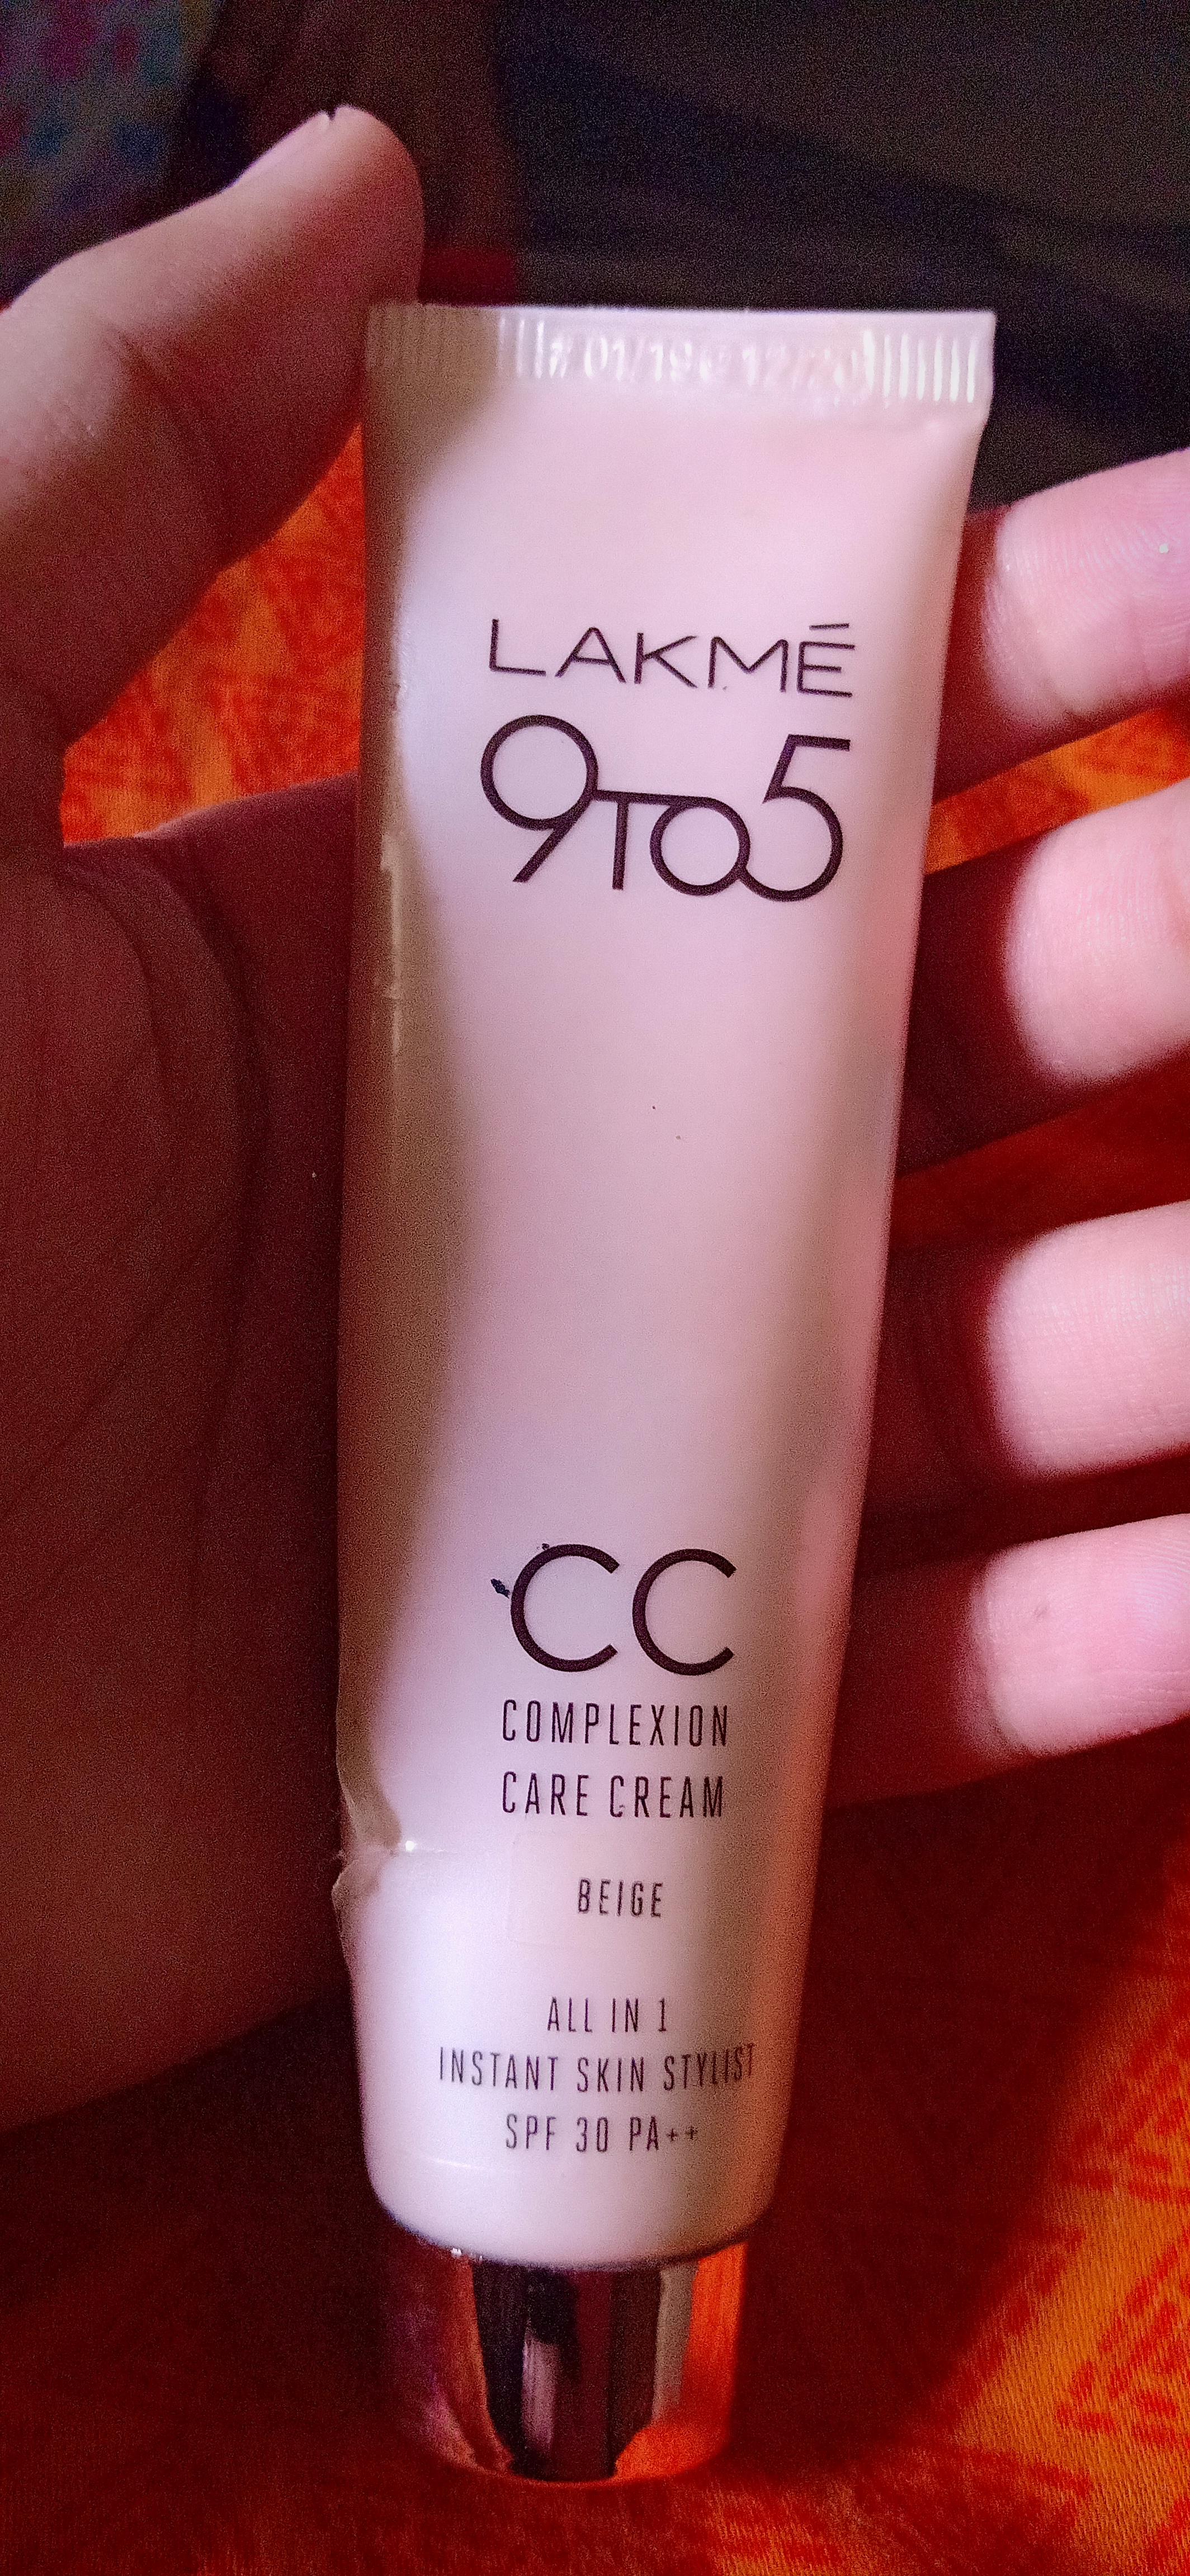 Lakme 9 To 5 Complexion Care CC Cream Reviews, Price